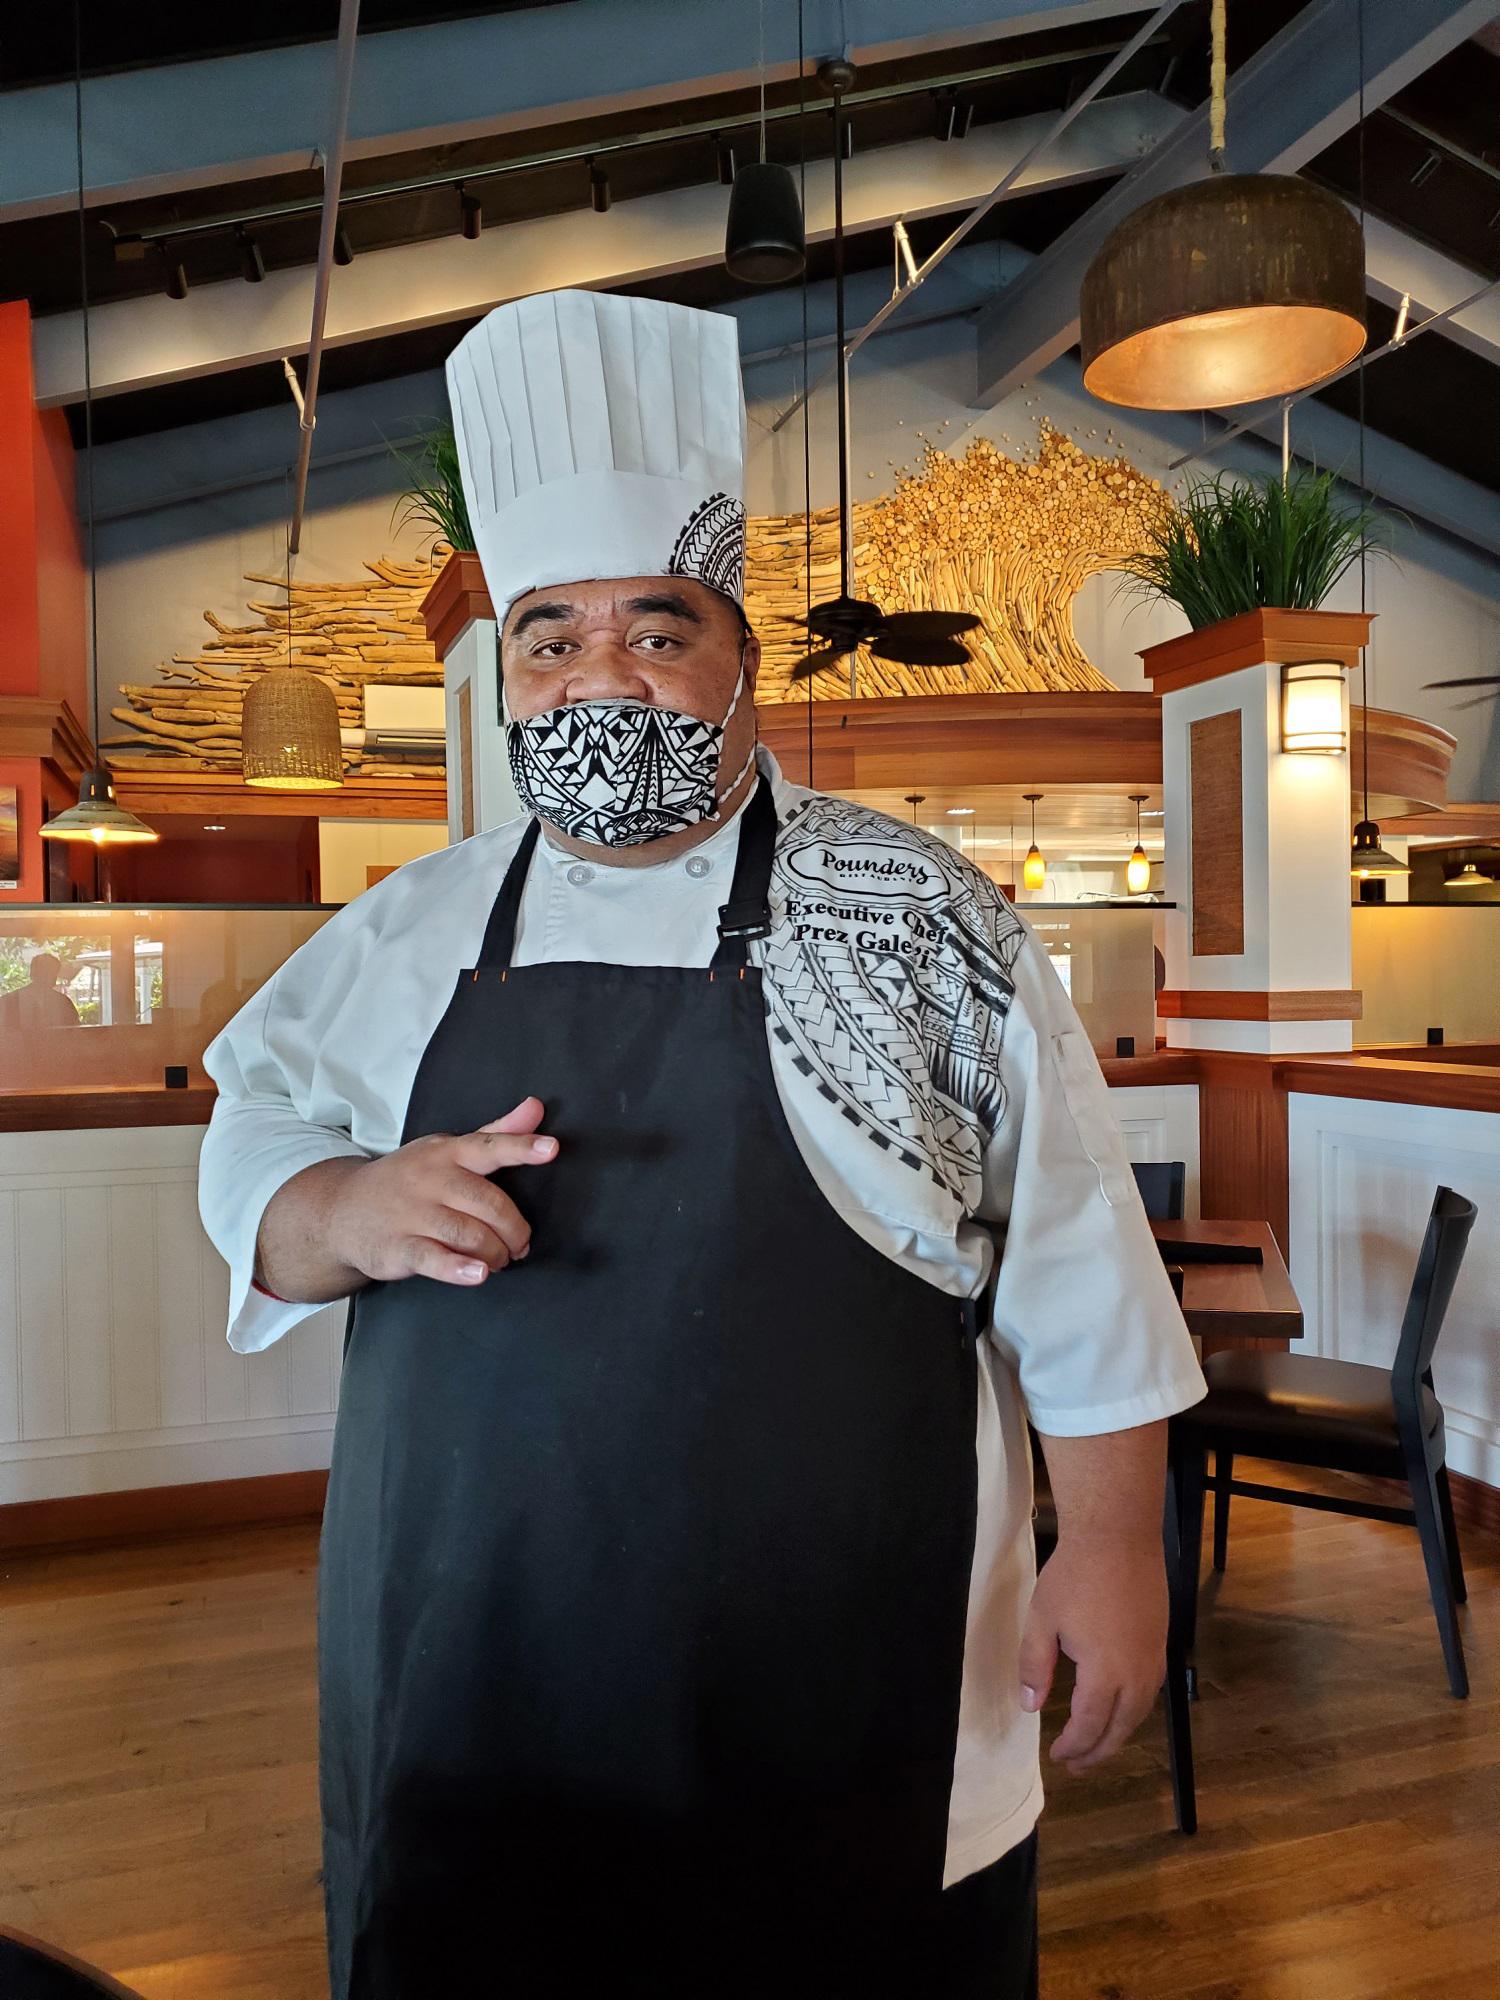 photo of Executive Chef Prez Galeai